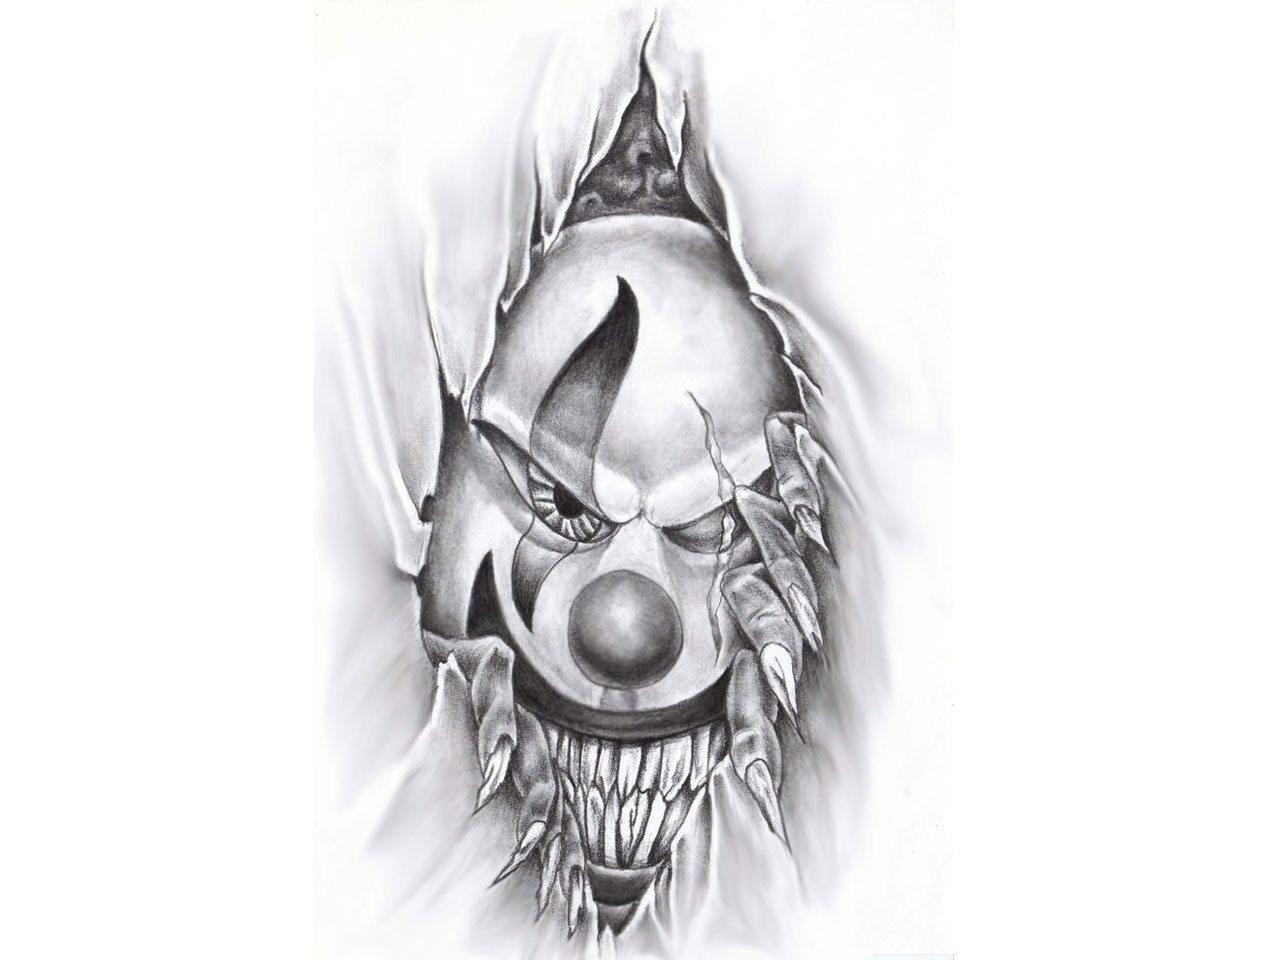 Ripped Skin Evil Clown Tattoo Design